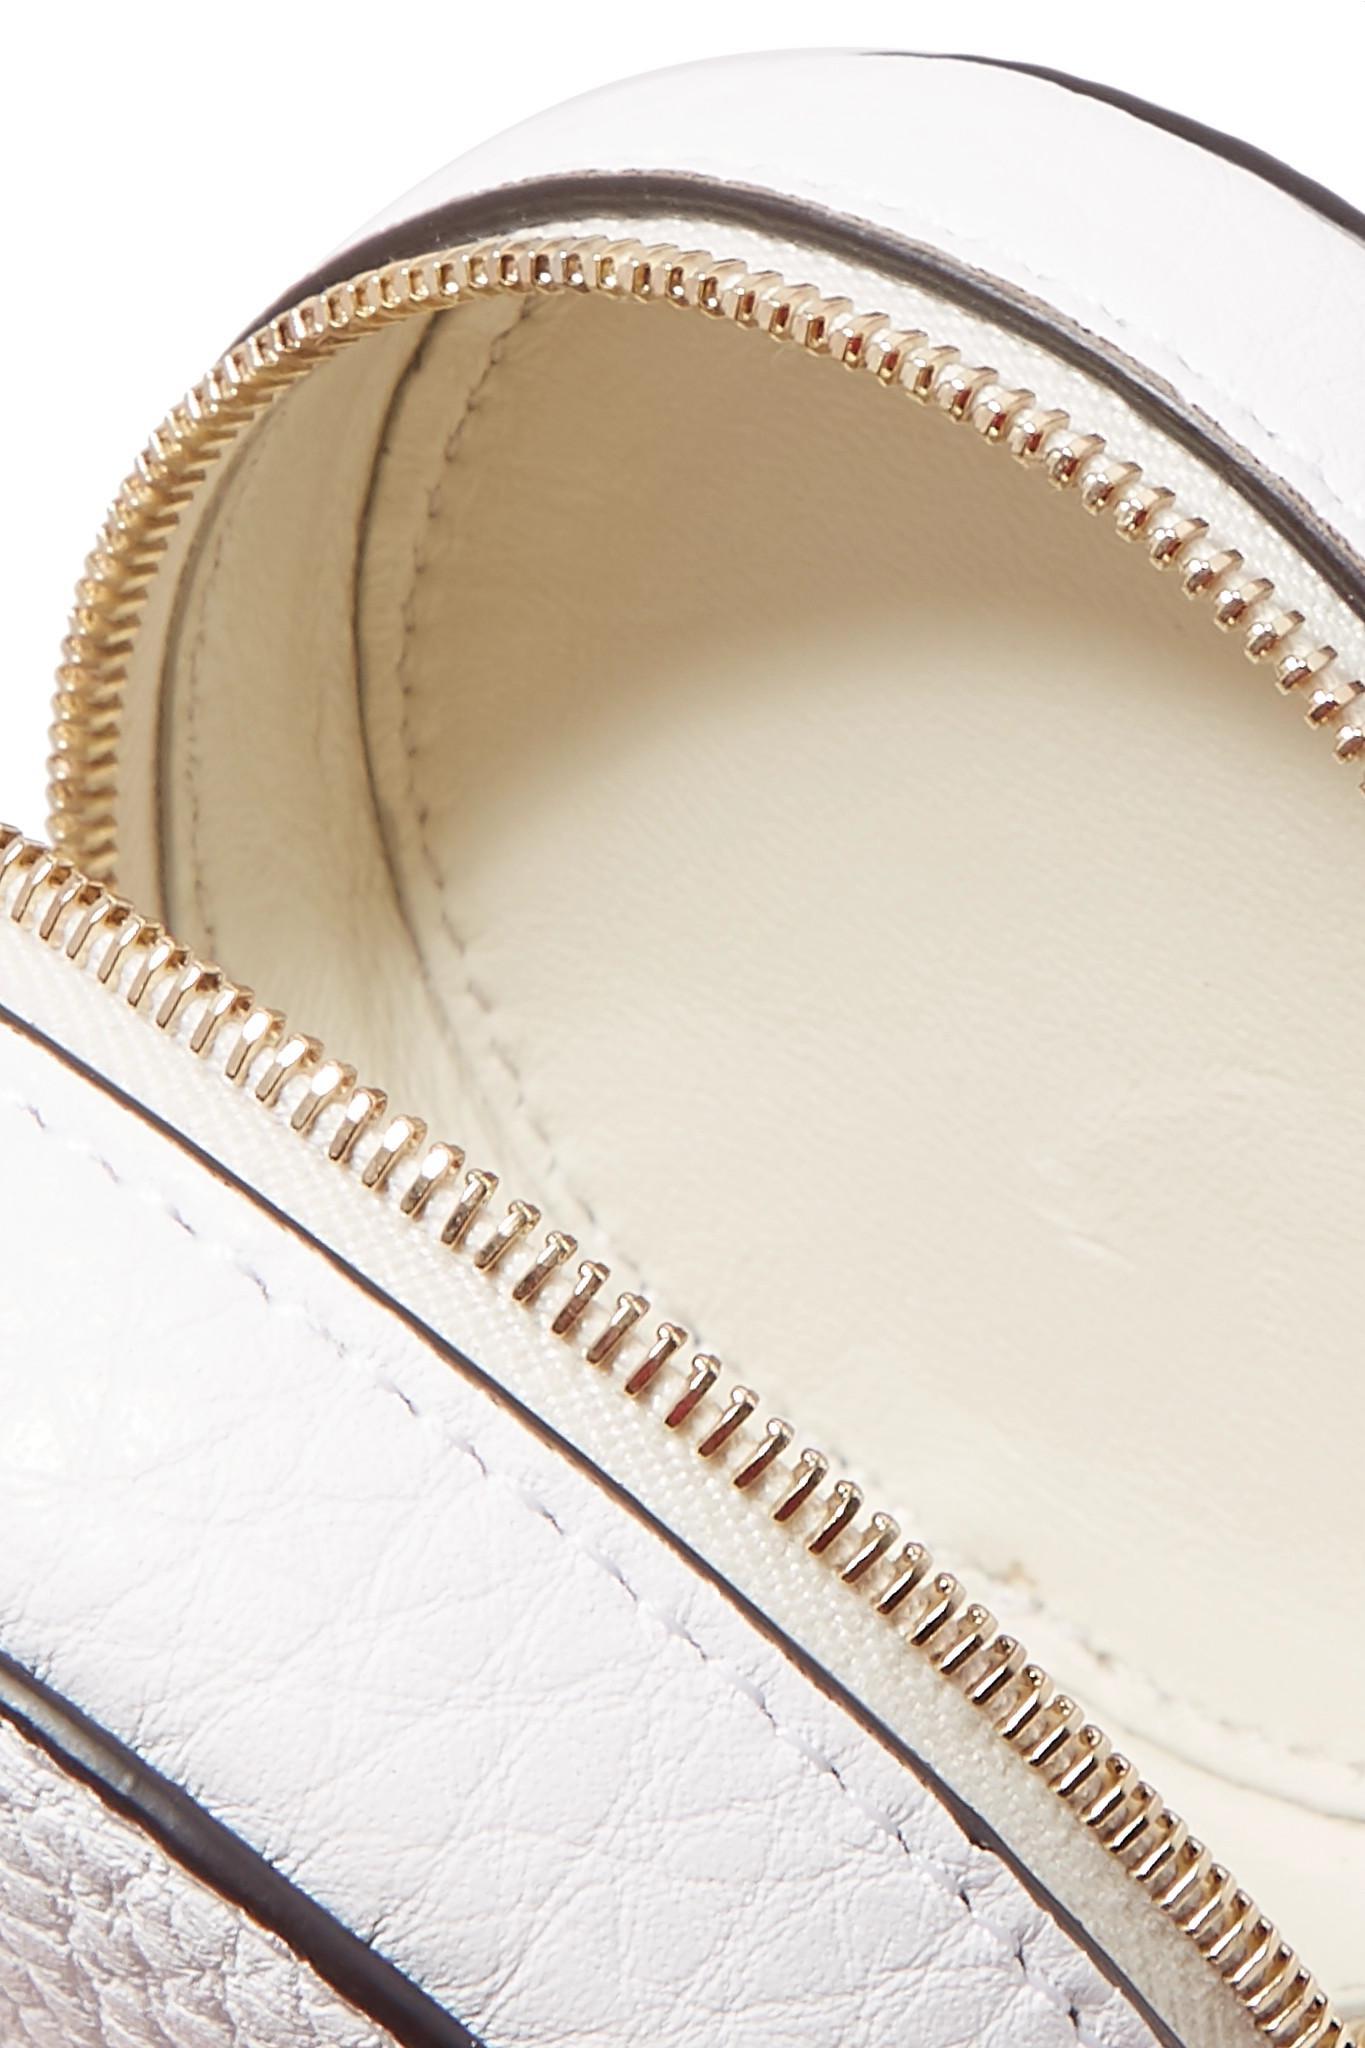 320d57f0e2 Fendi - White + Fila Appliquéd Leather Bag Charm And Shell Backpack - Lyst.  View fullscreen